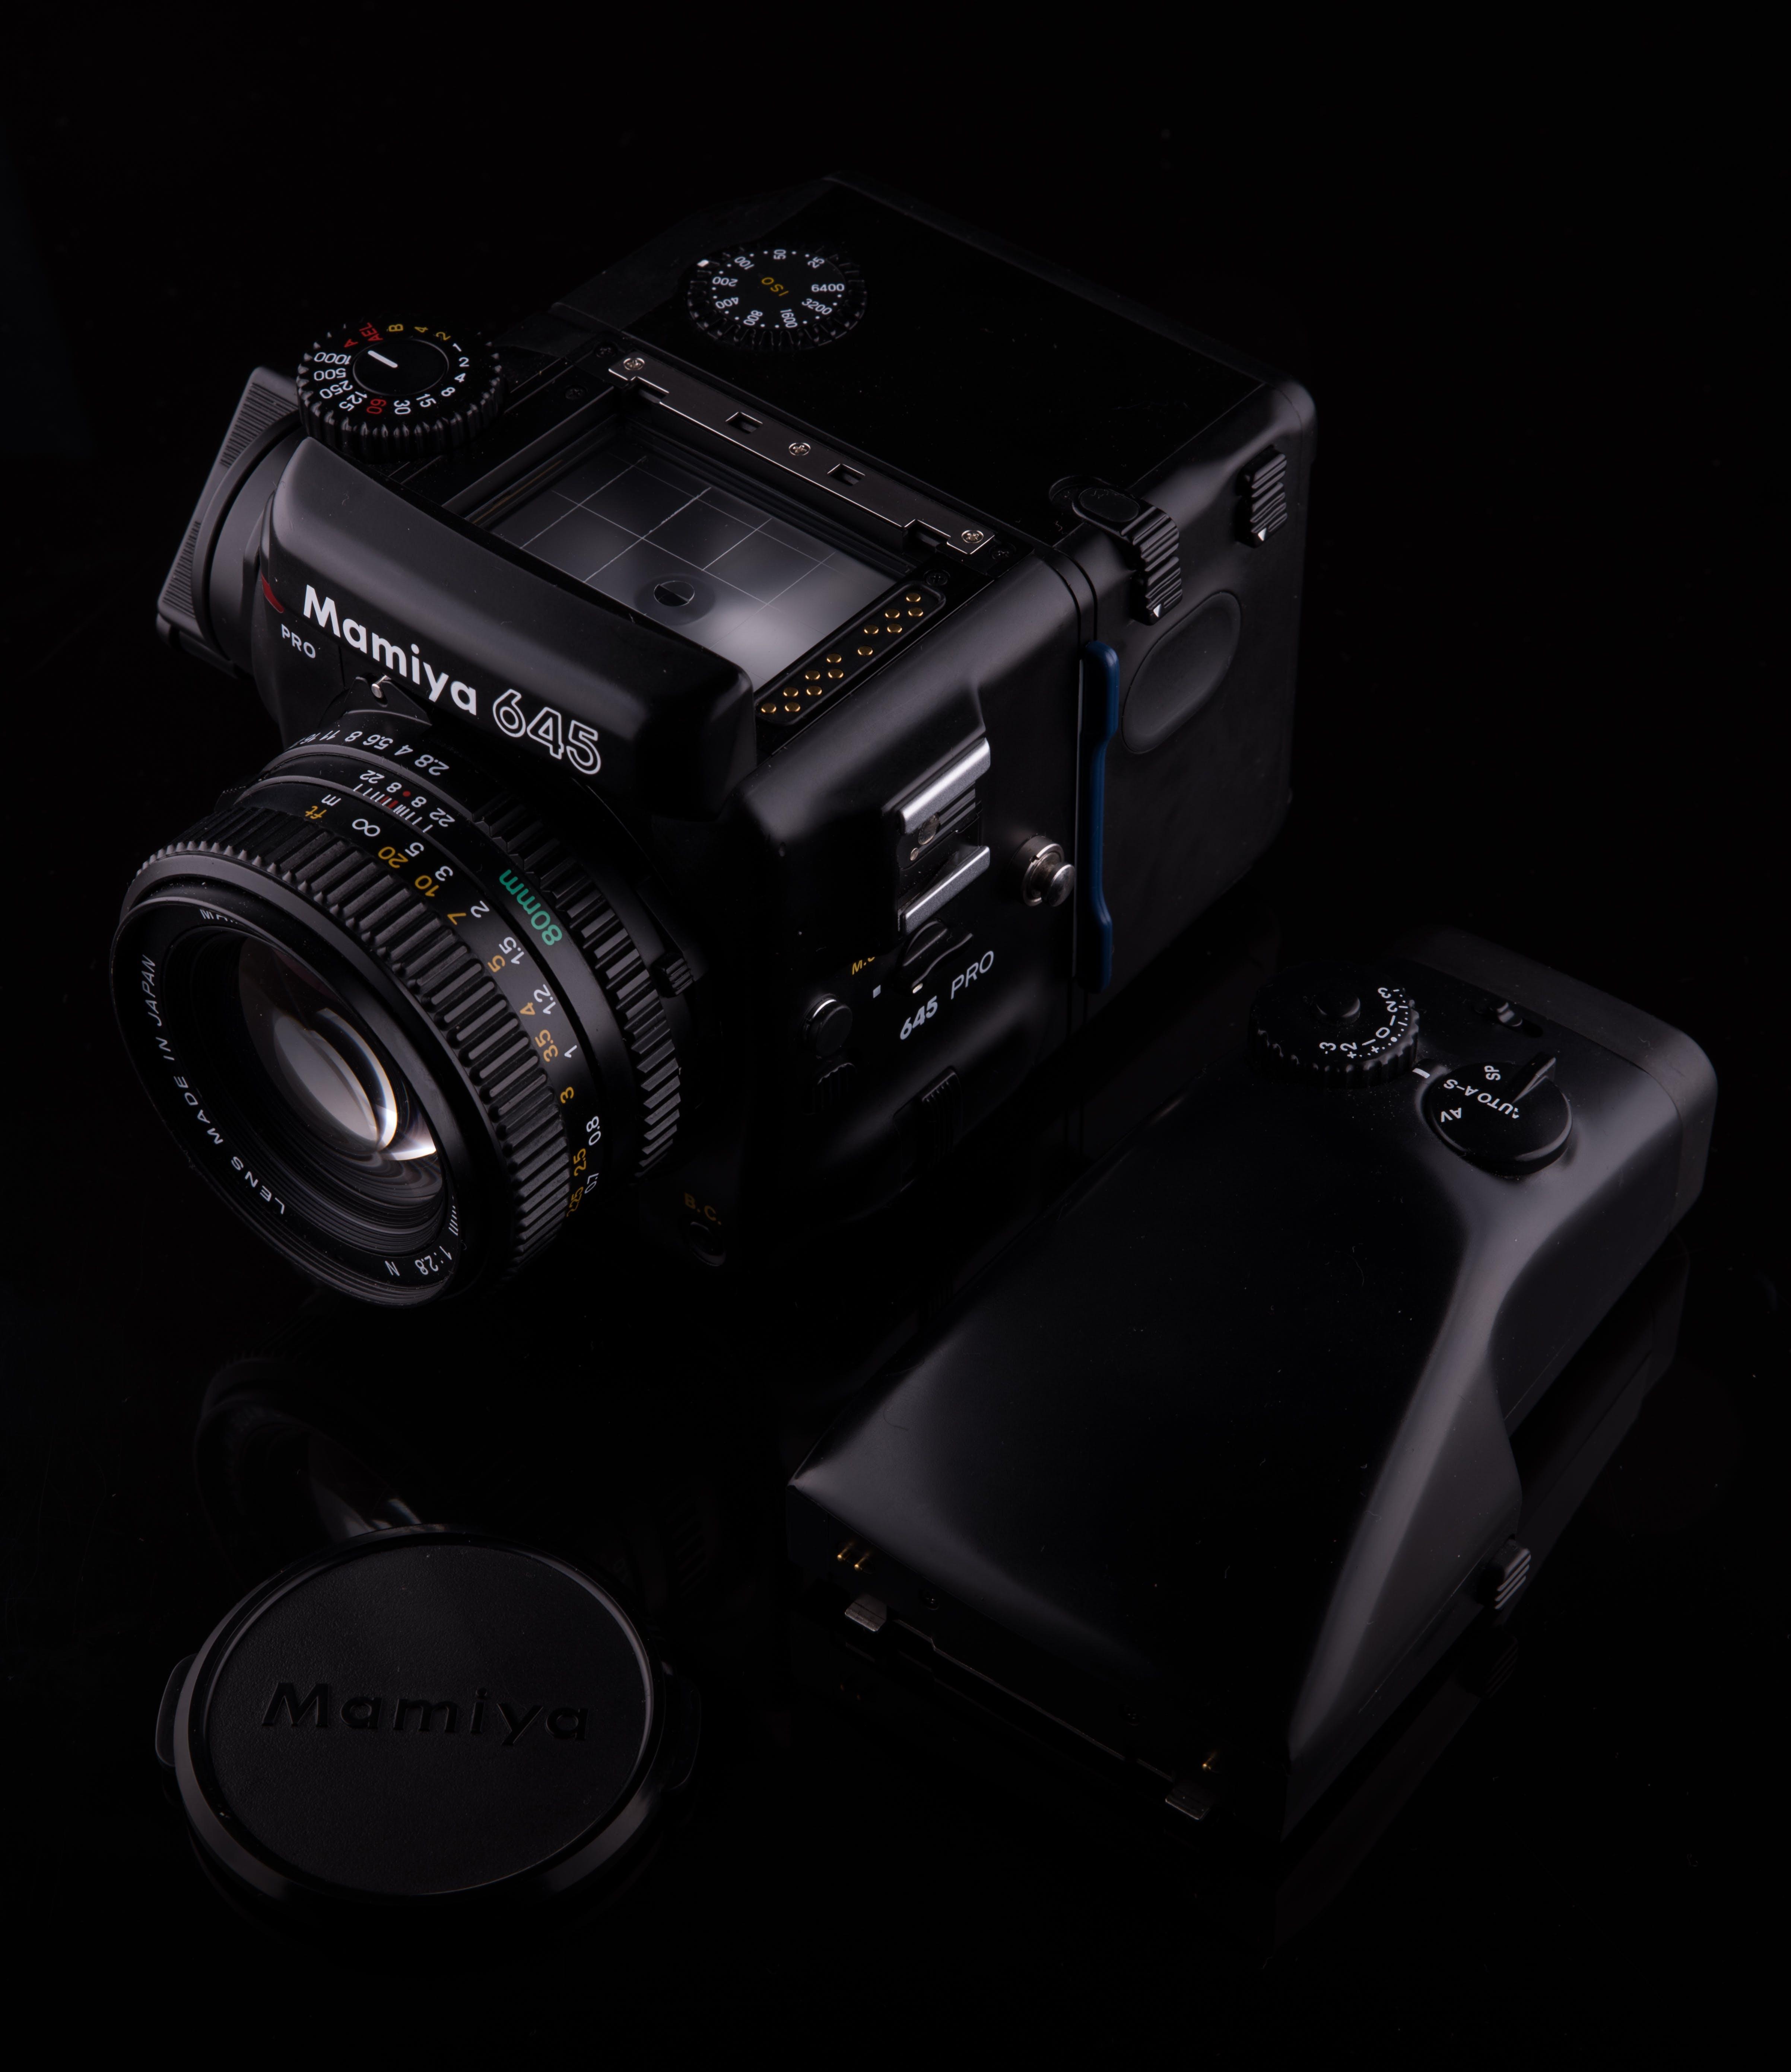 Black Mamiya Camera Set